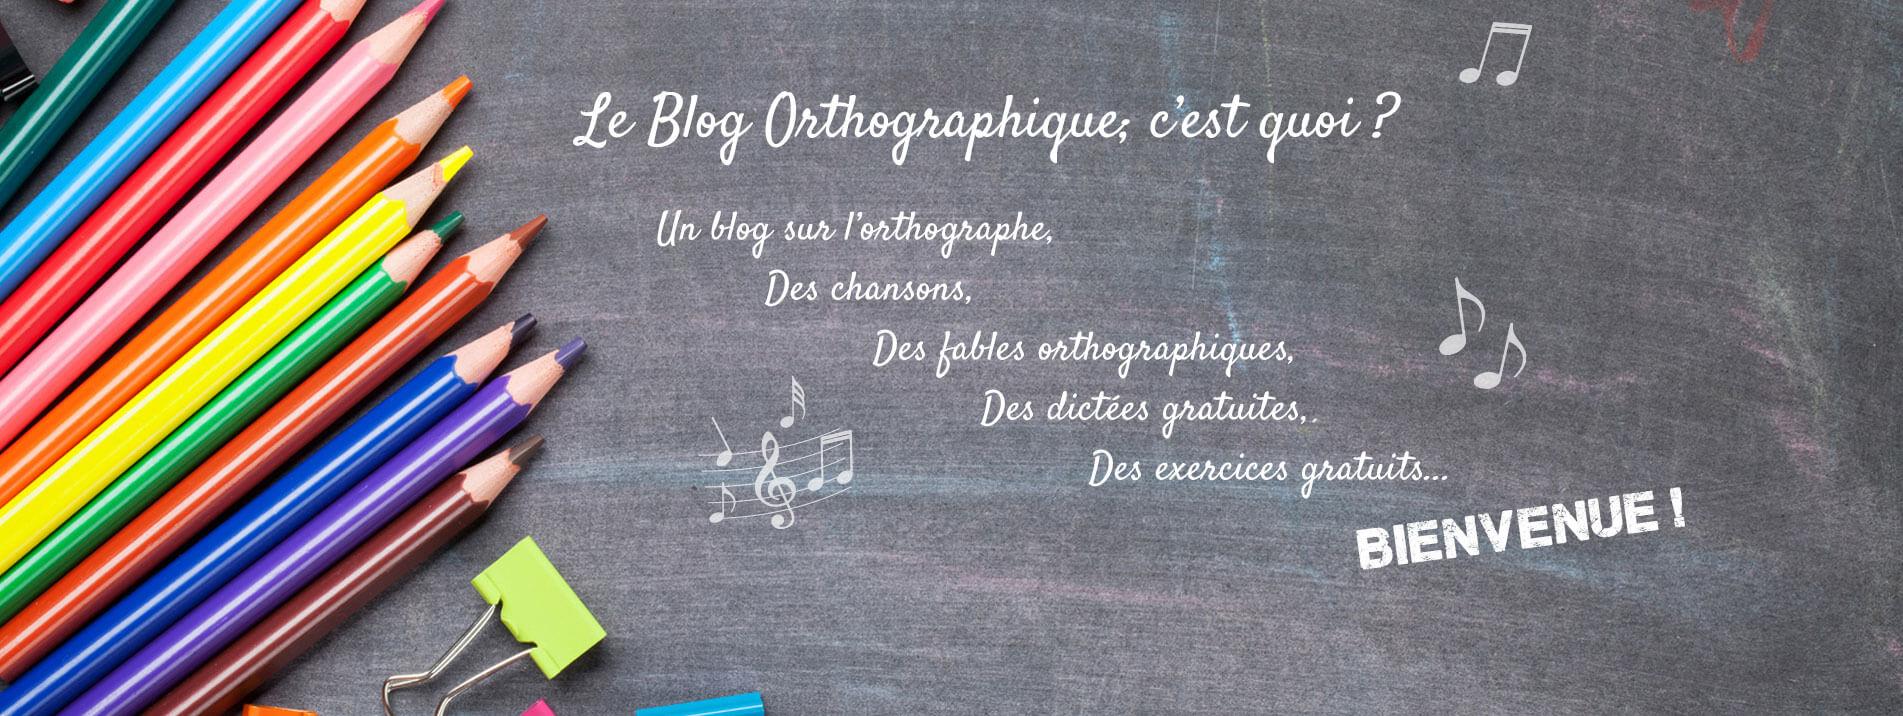 Le Blog Orthographique : améliorer son orthographe